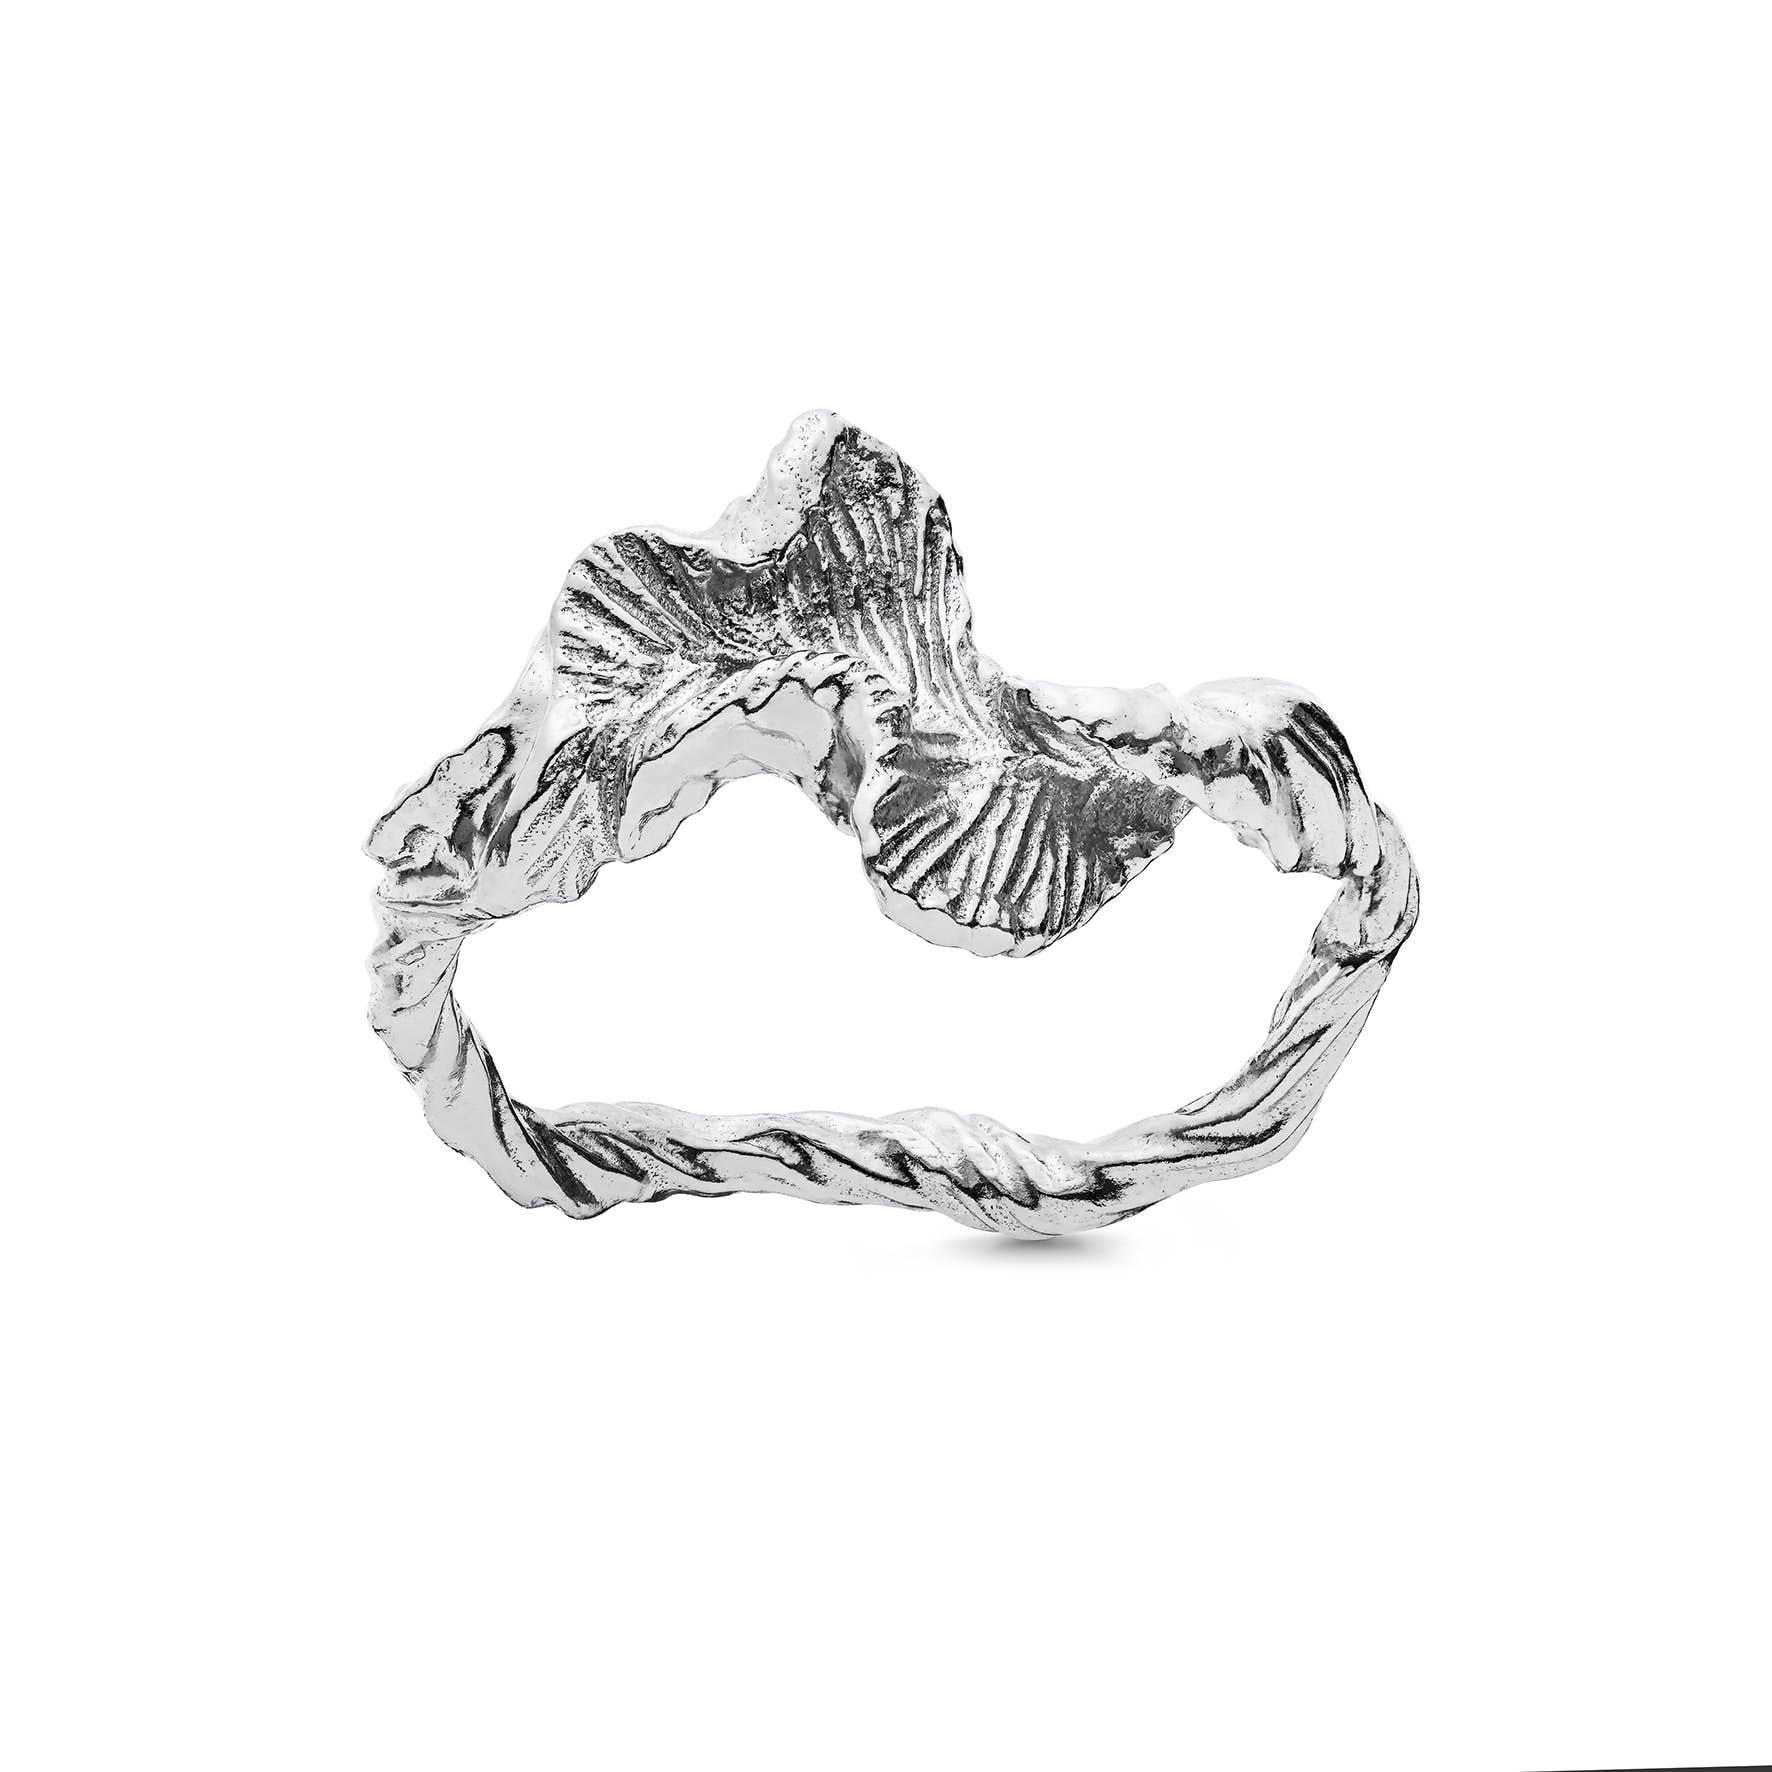 Nino Ring from Maanesten in Silver Sterling 925